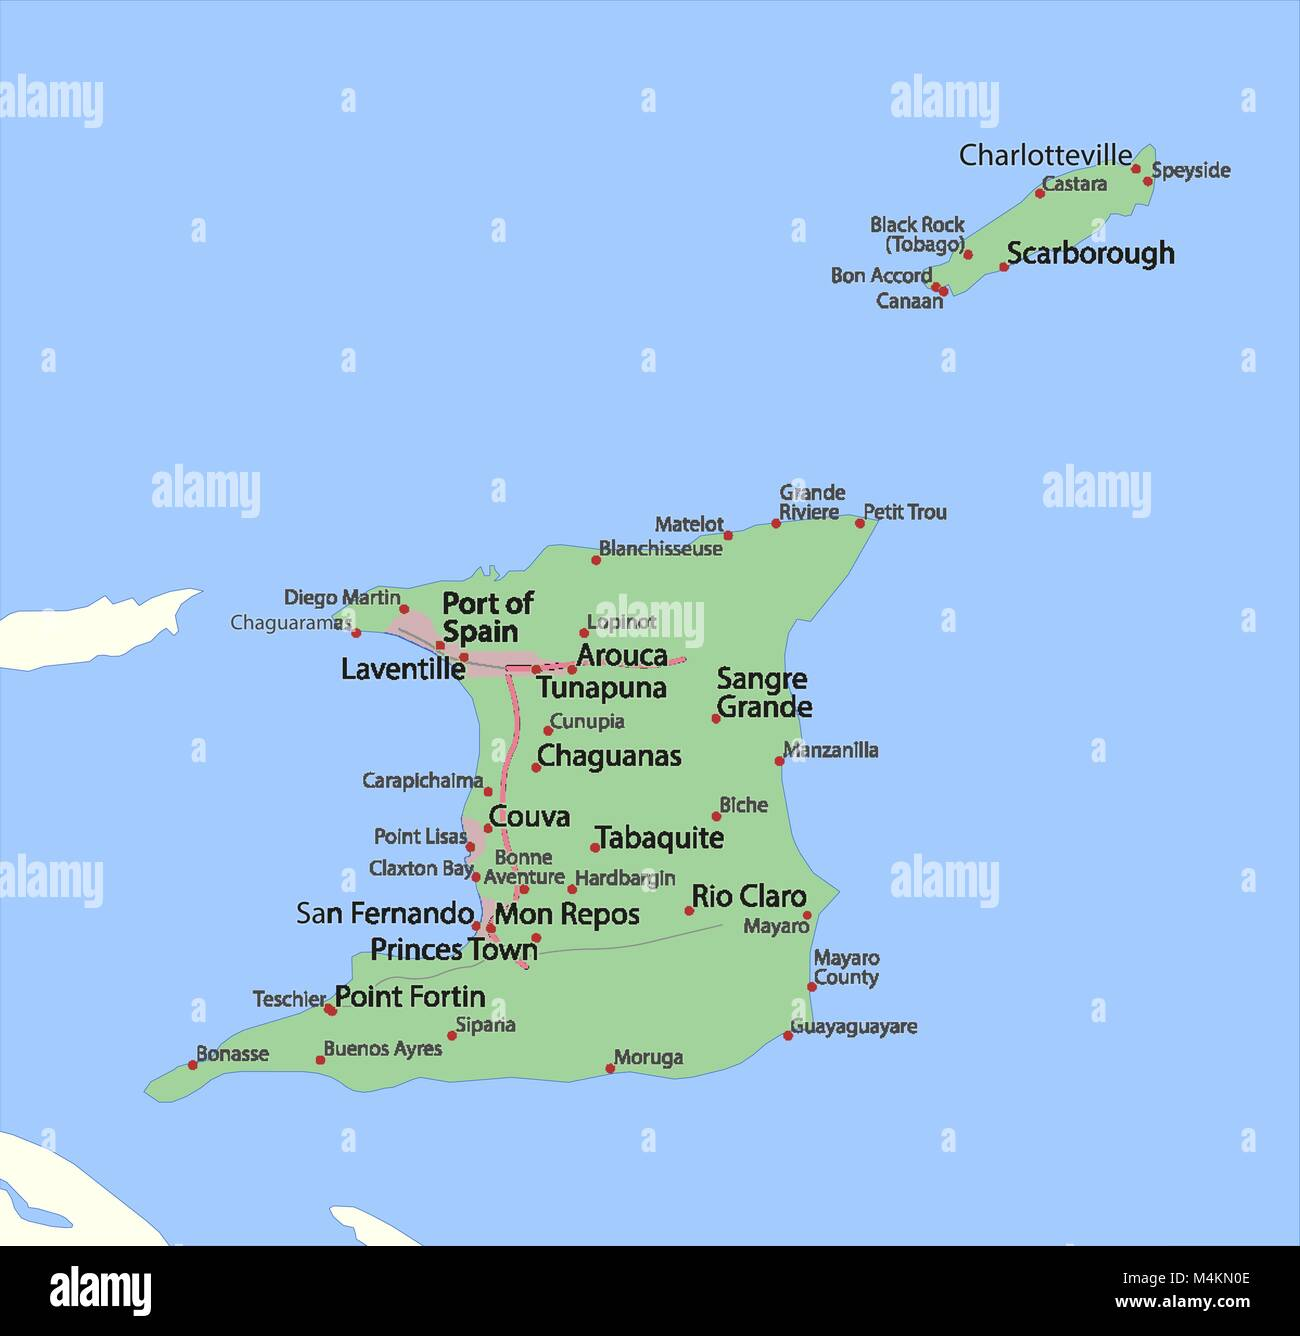 Trinidad Vector Map Stock Photos & Trinidad Vector Map Stock ...